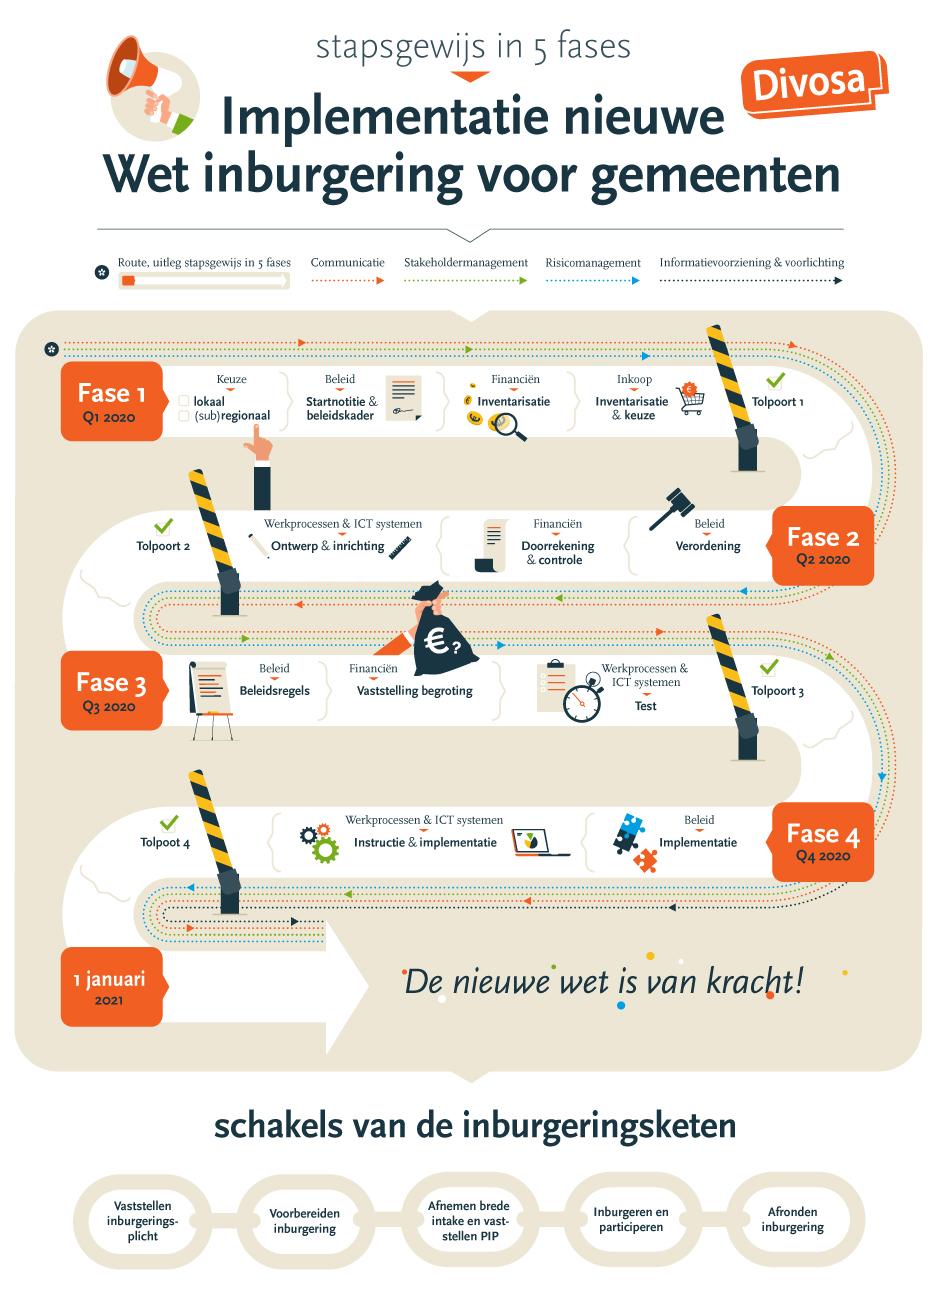 infographic laten maken, animatie laten maken, freelance illustrator, reclamebureau rotterdam, animatie laten maken Rotterdam, infographic laten maken Rotterdam